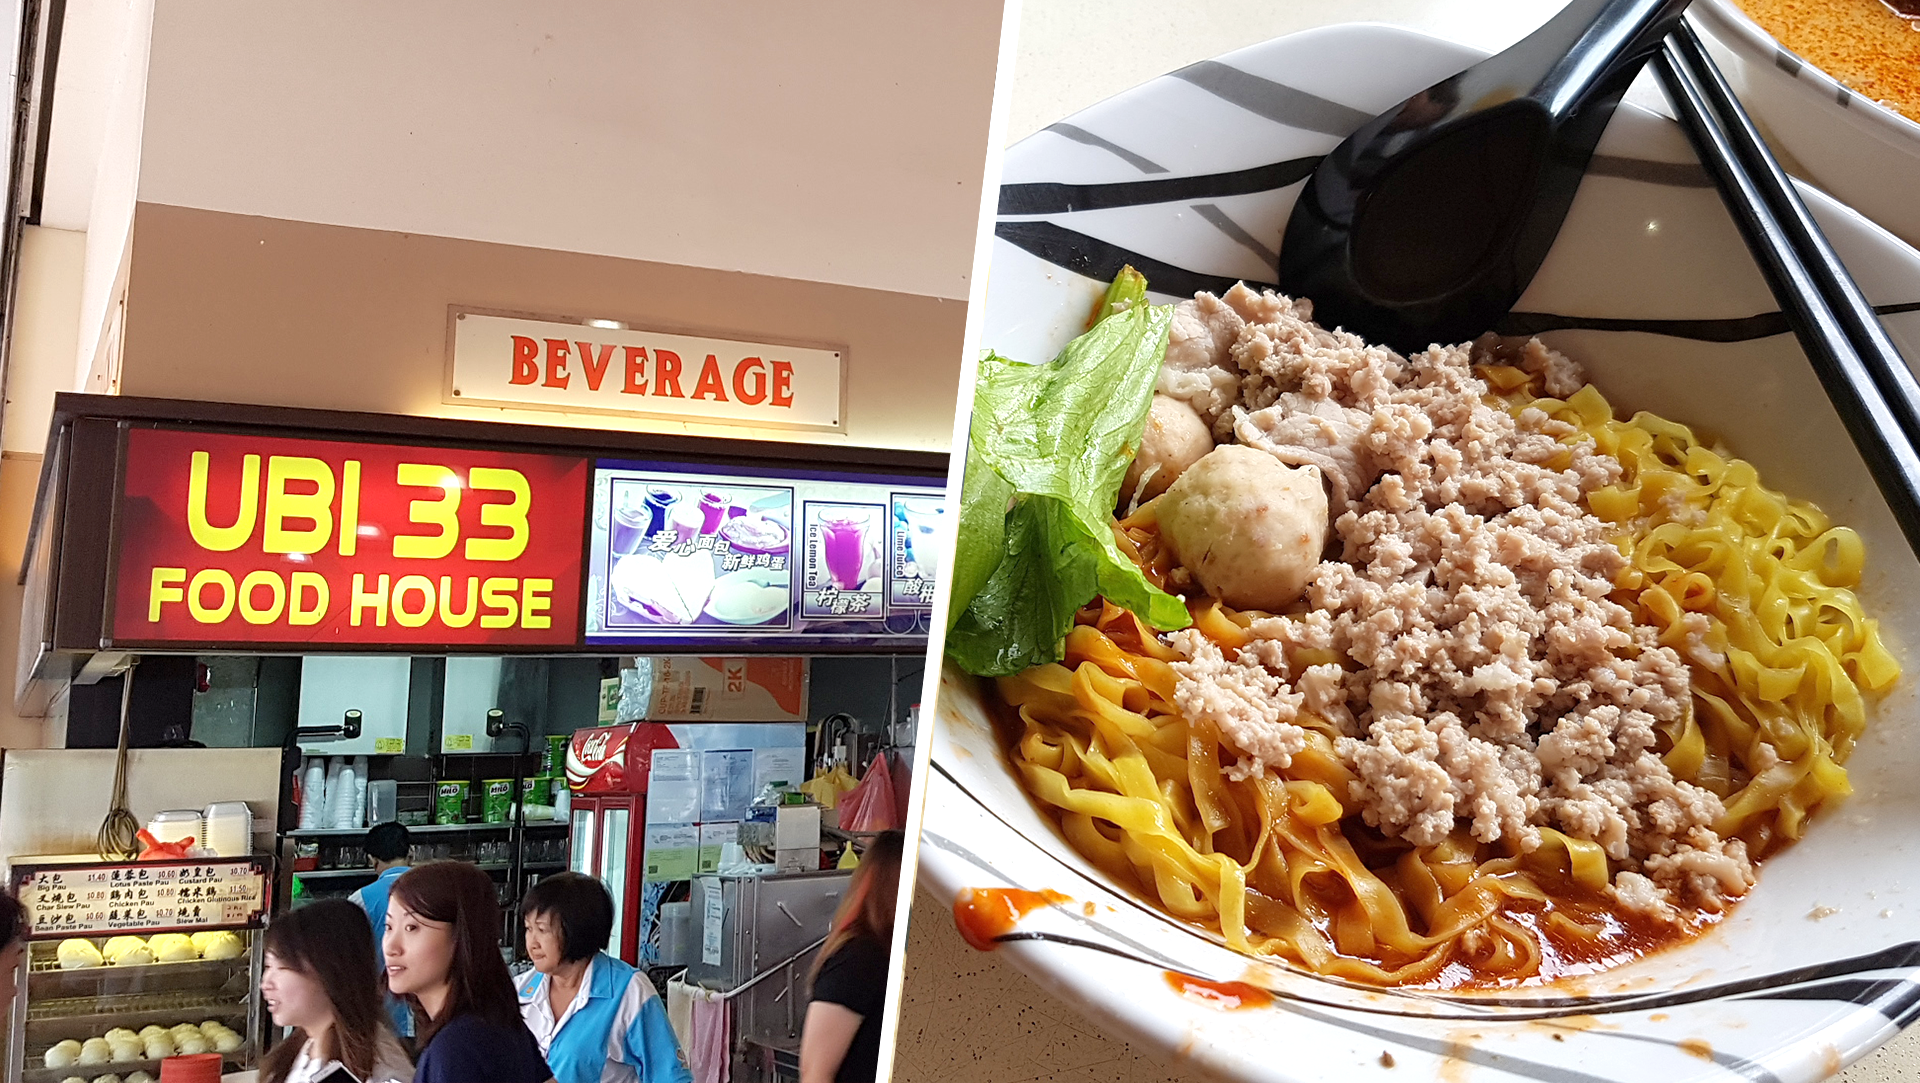 Ubi 33 Food House - 33 Ubi Avenue 3